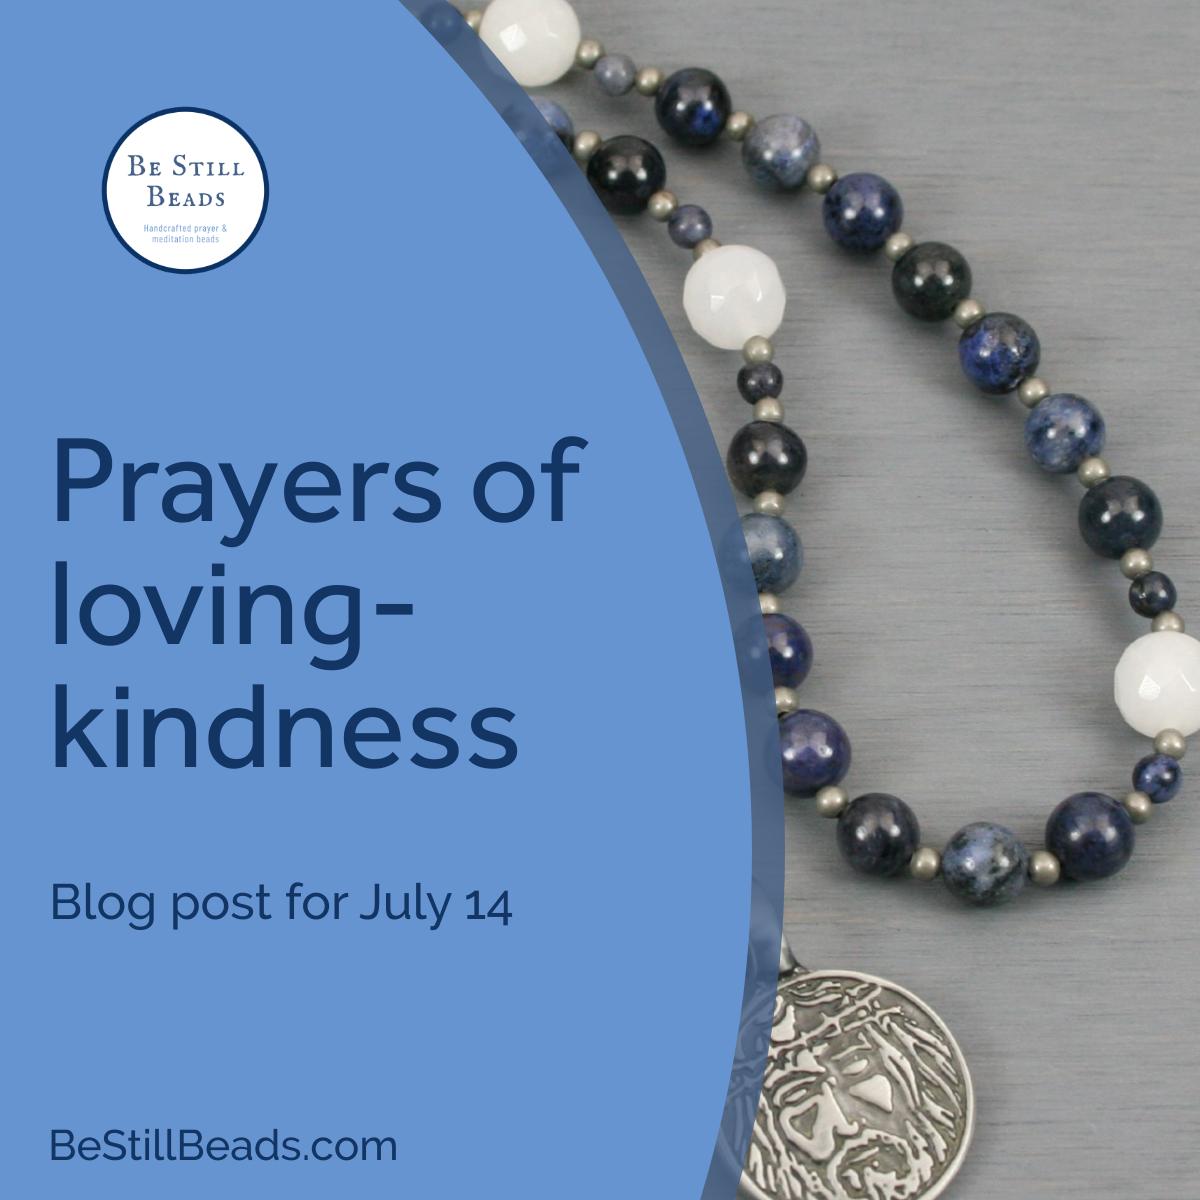 Prayers of loving-kindness